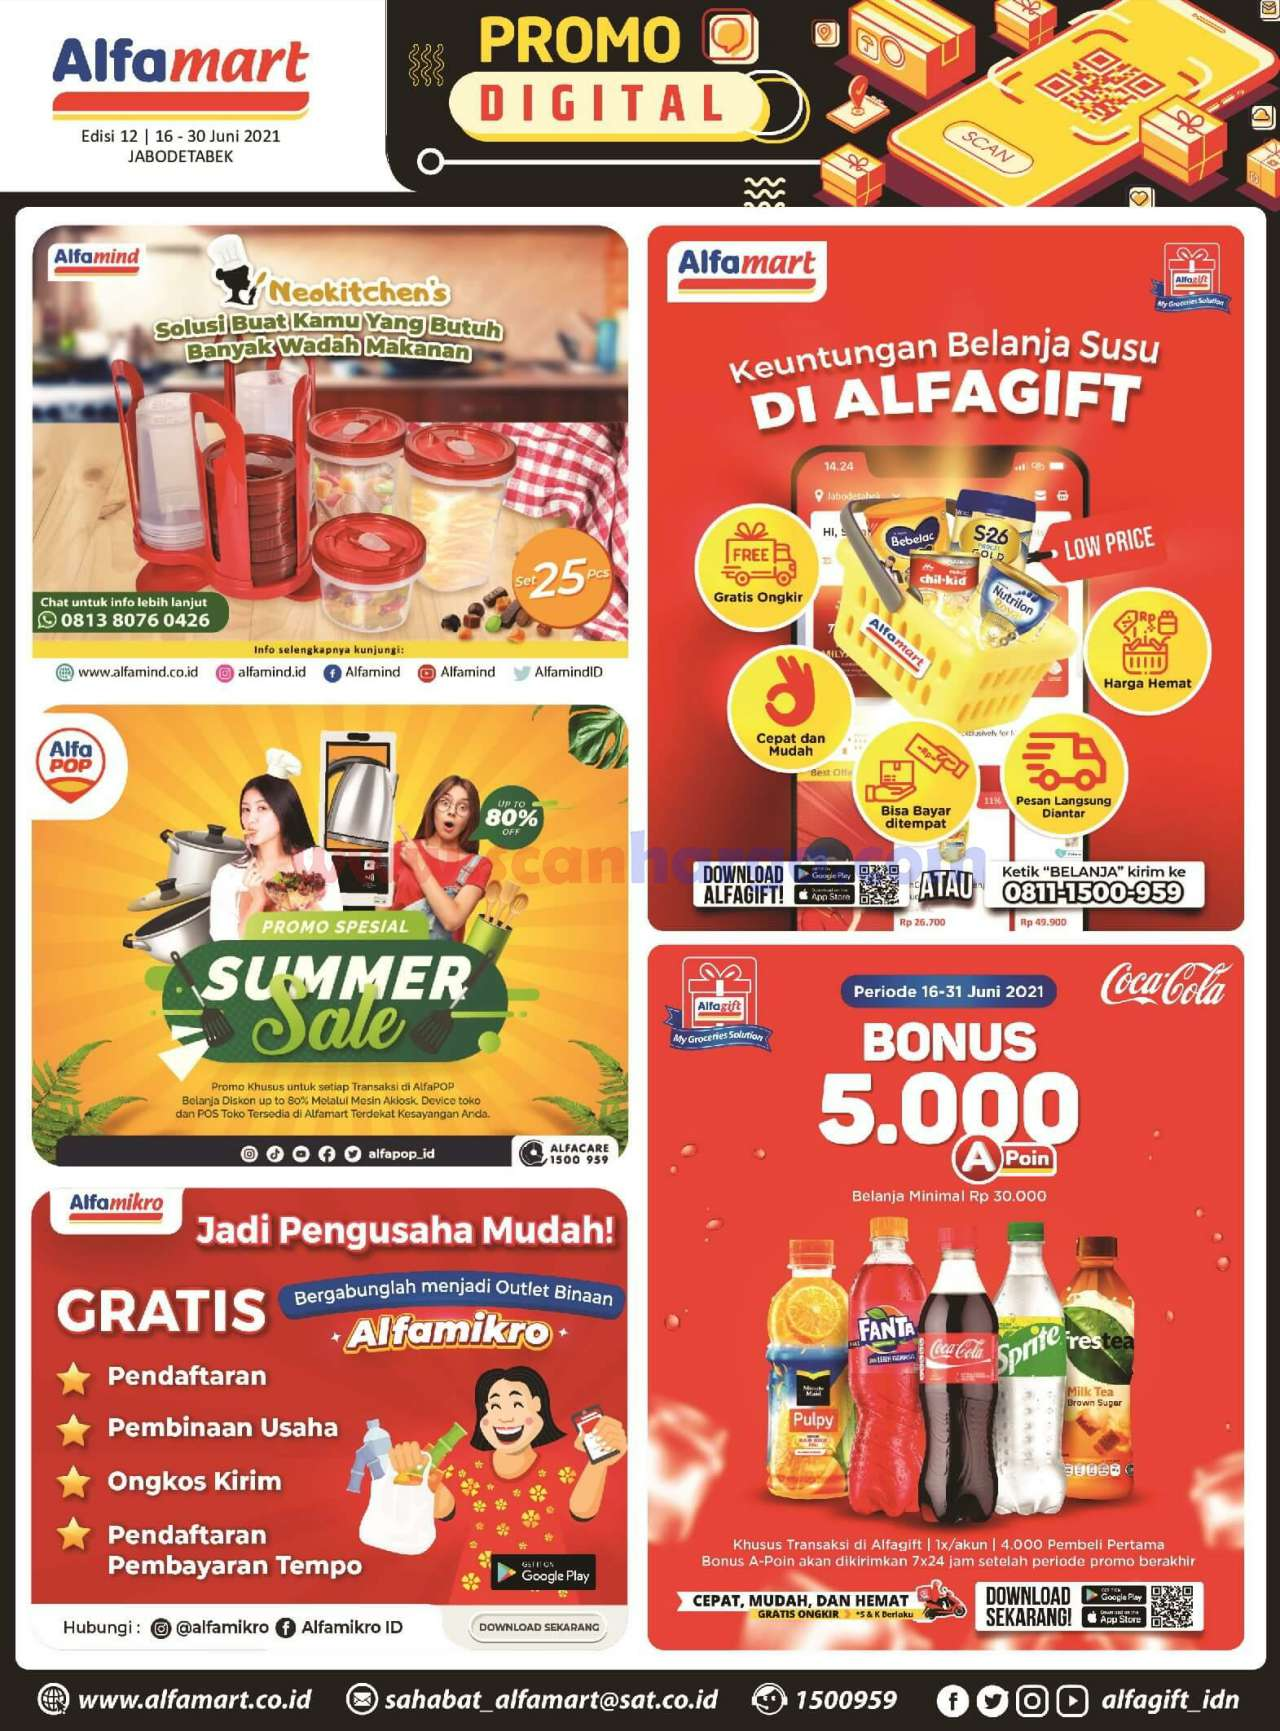 Katalog Promo Alfamart 16 - 30 Juni 2021 15